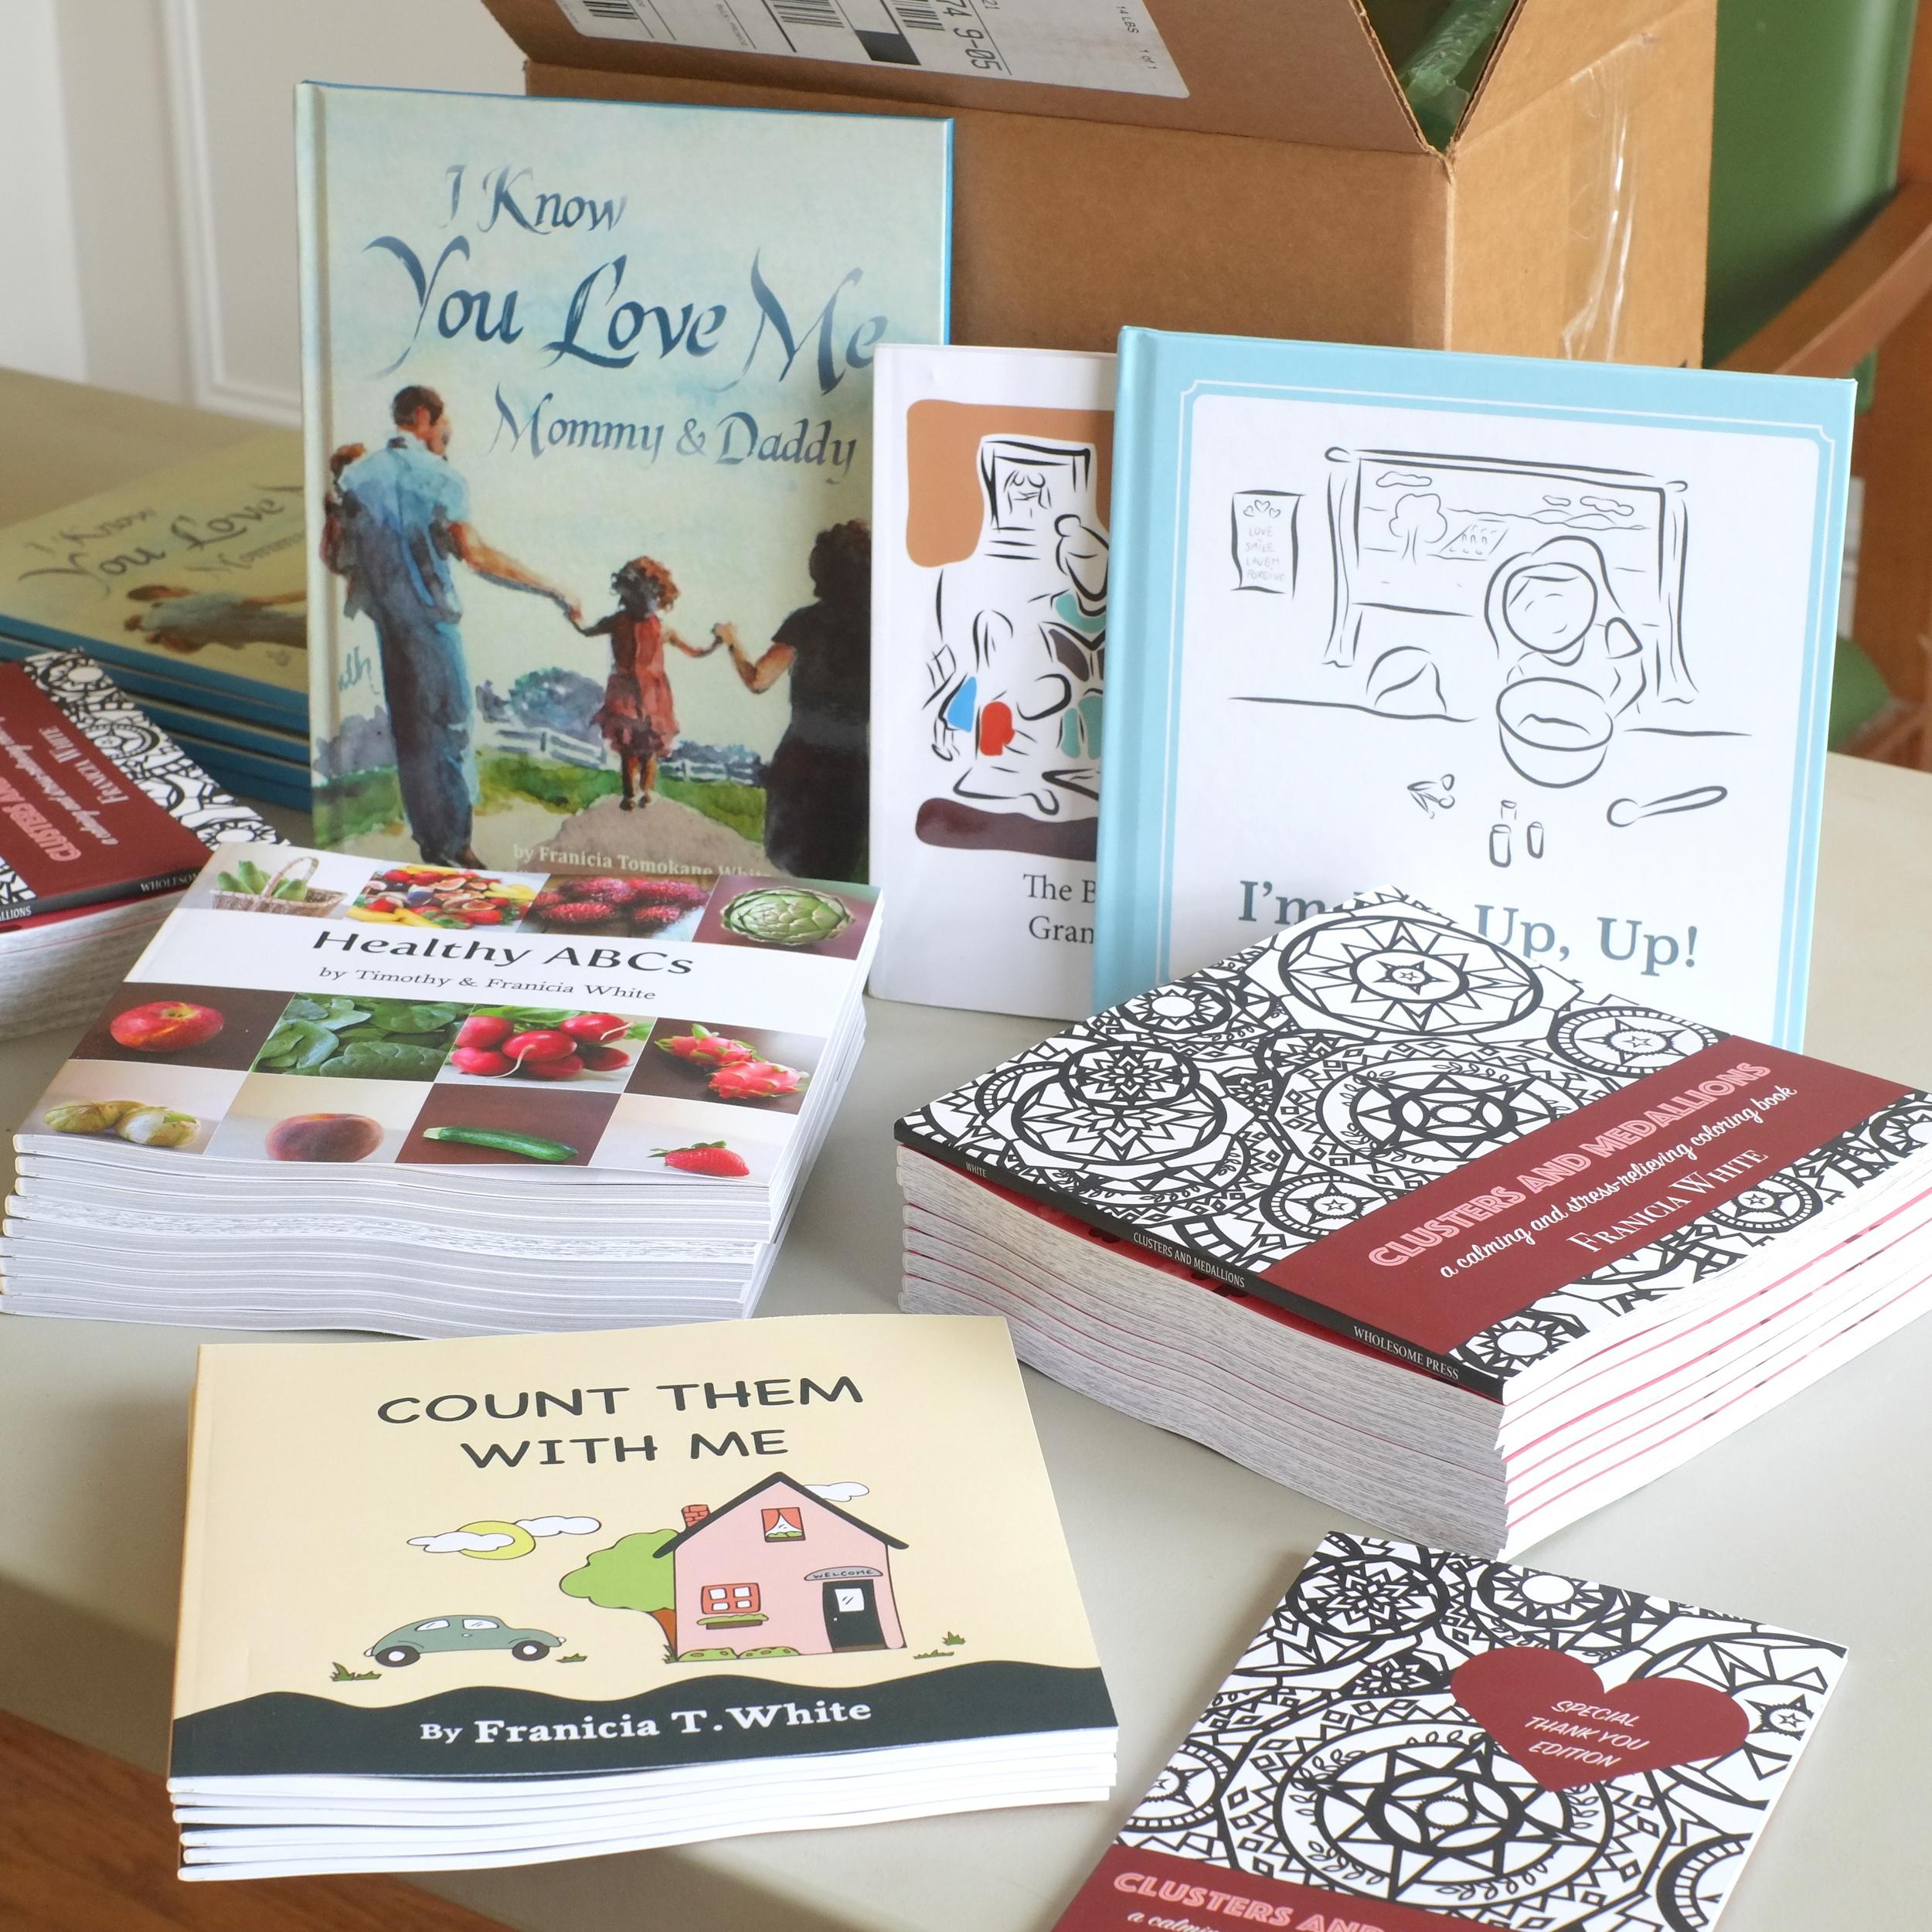 Tim and Franicia — Our Books